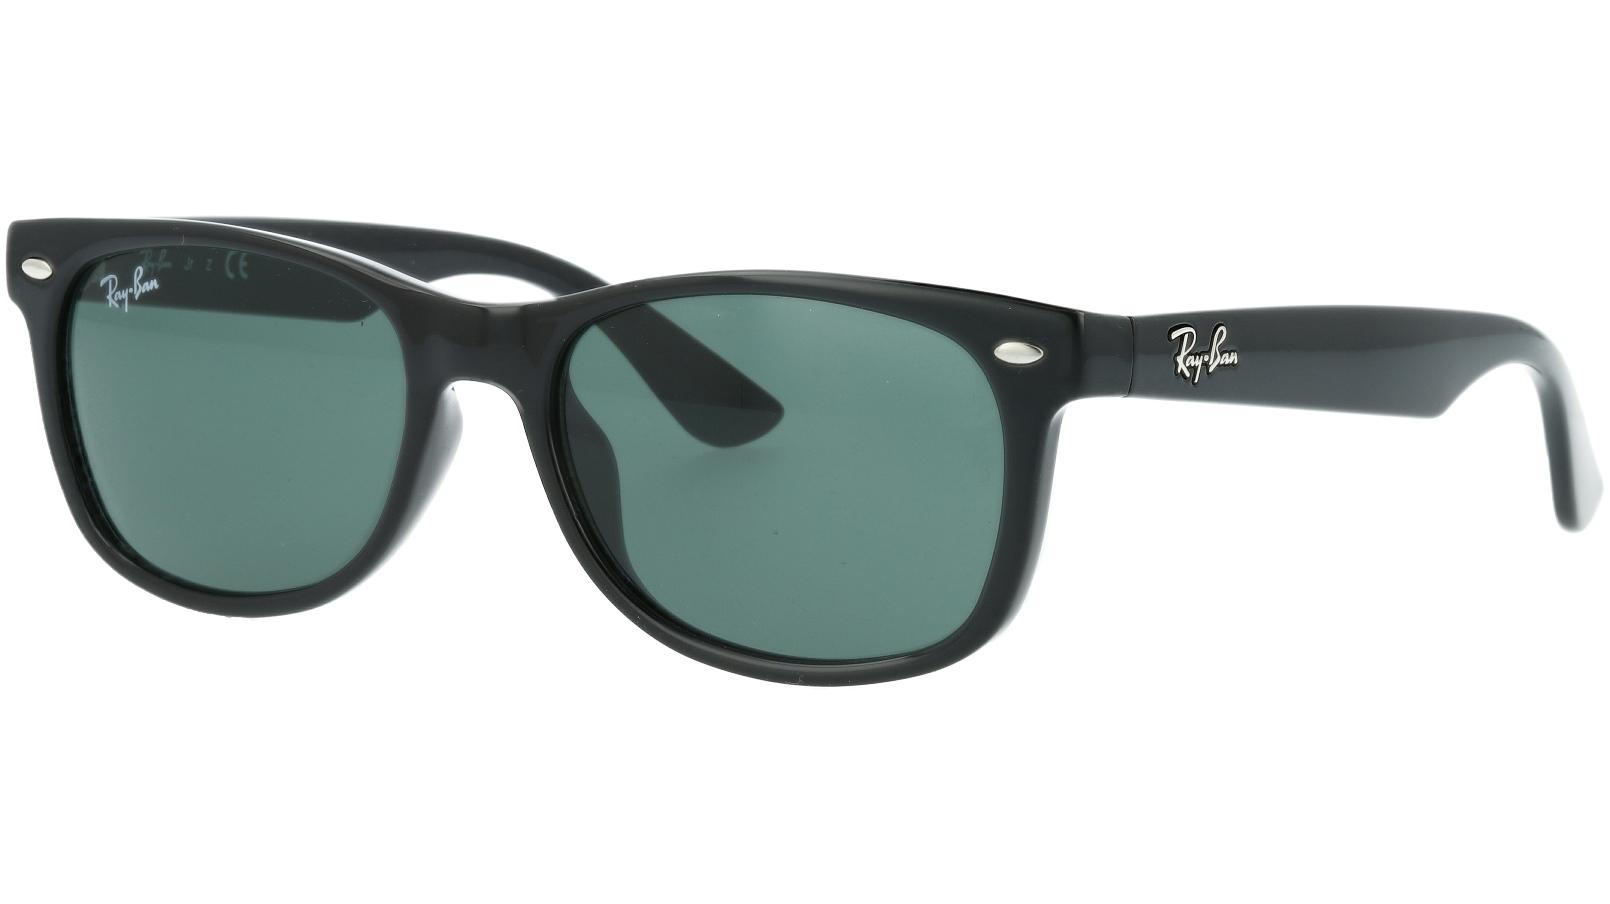 RAYBAN RJ9052S 100/71 47 BLACK Sunglasses